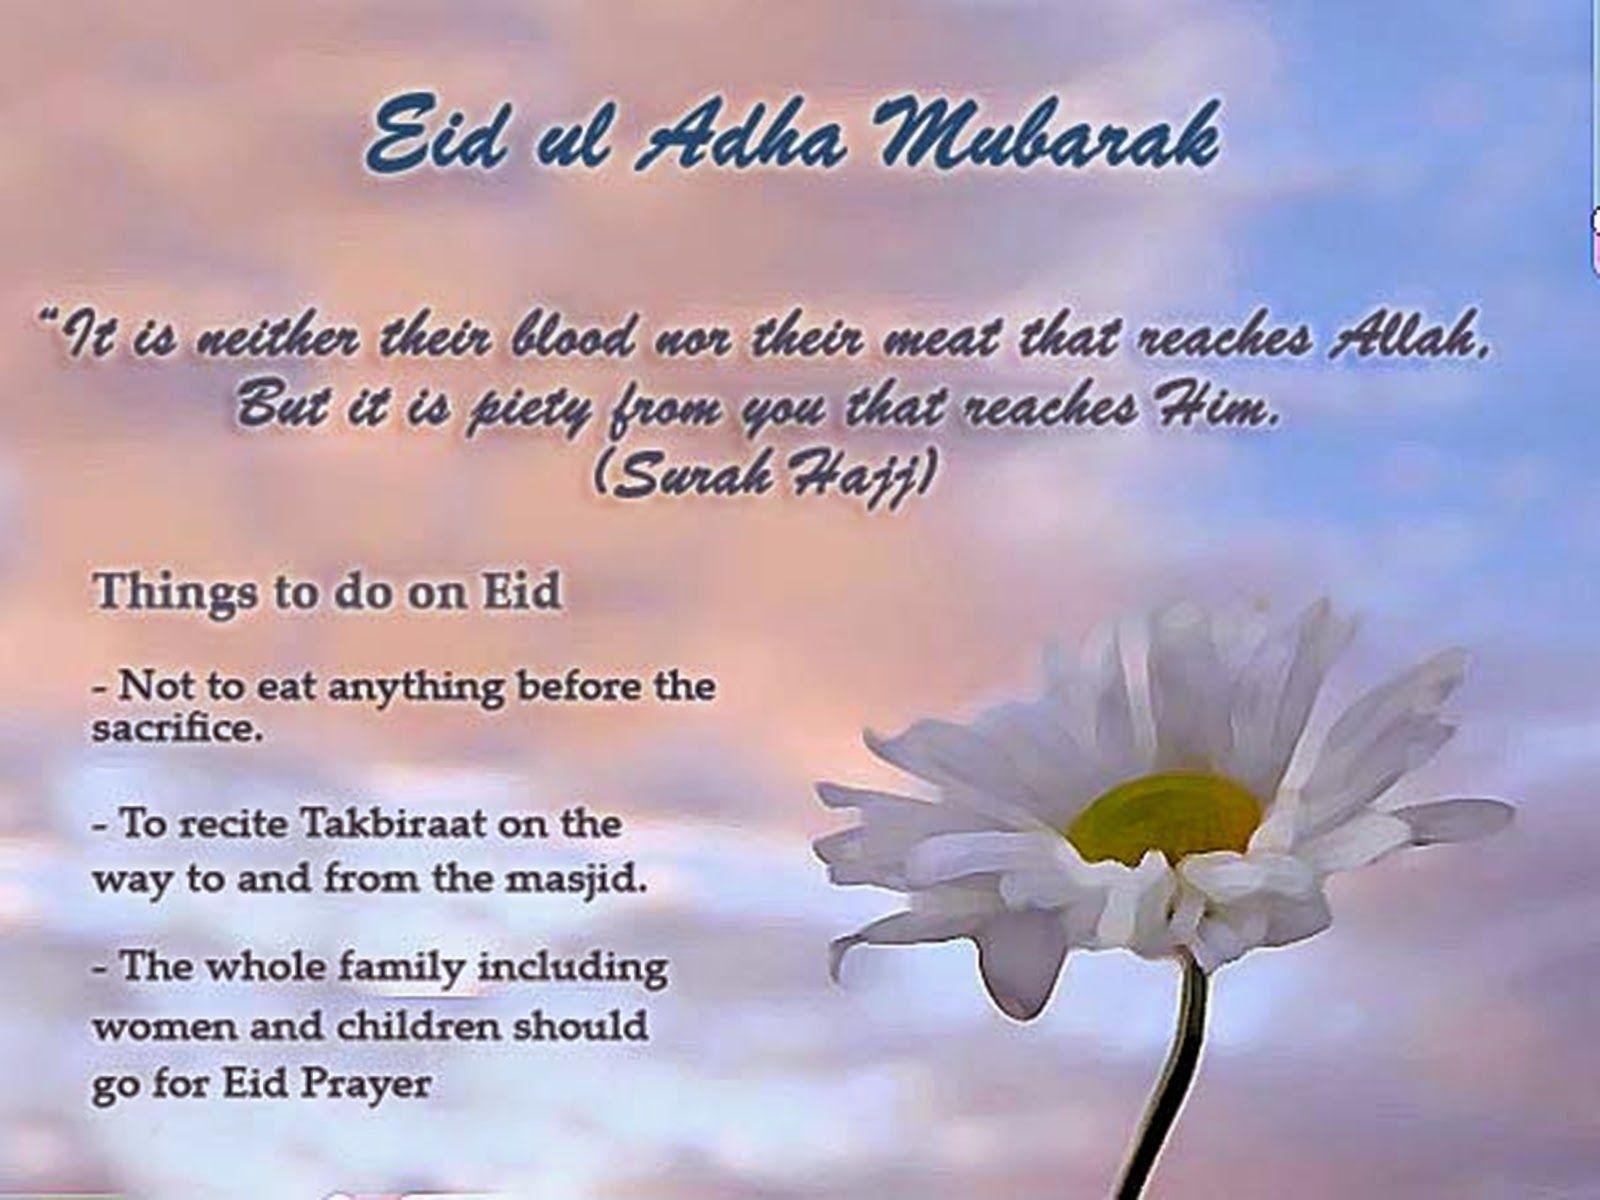 Pin by sarah jean on eid mubarak pinterest eid islam and happy eid mubarak wishes messages for friends kristyandbryce Choice Image